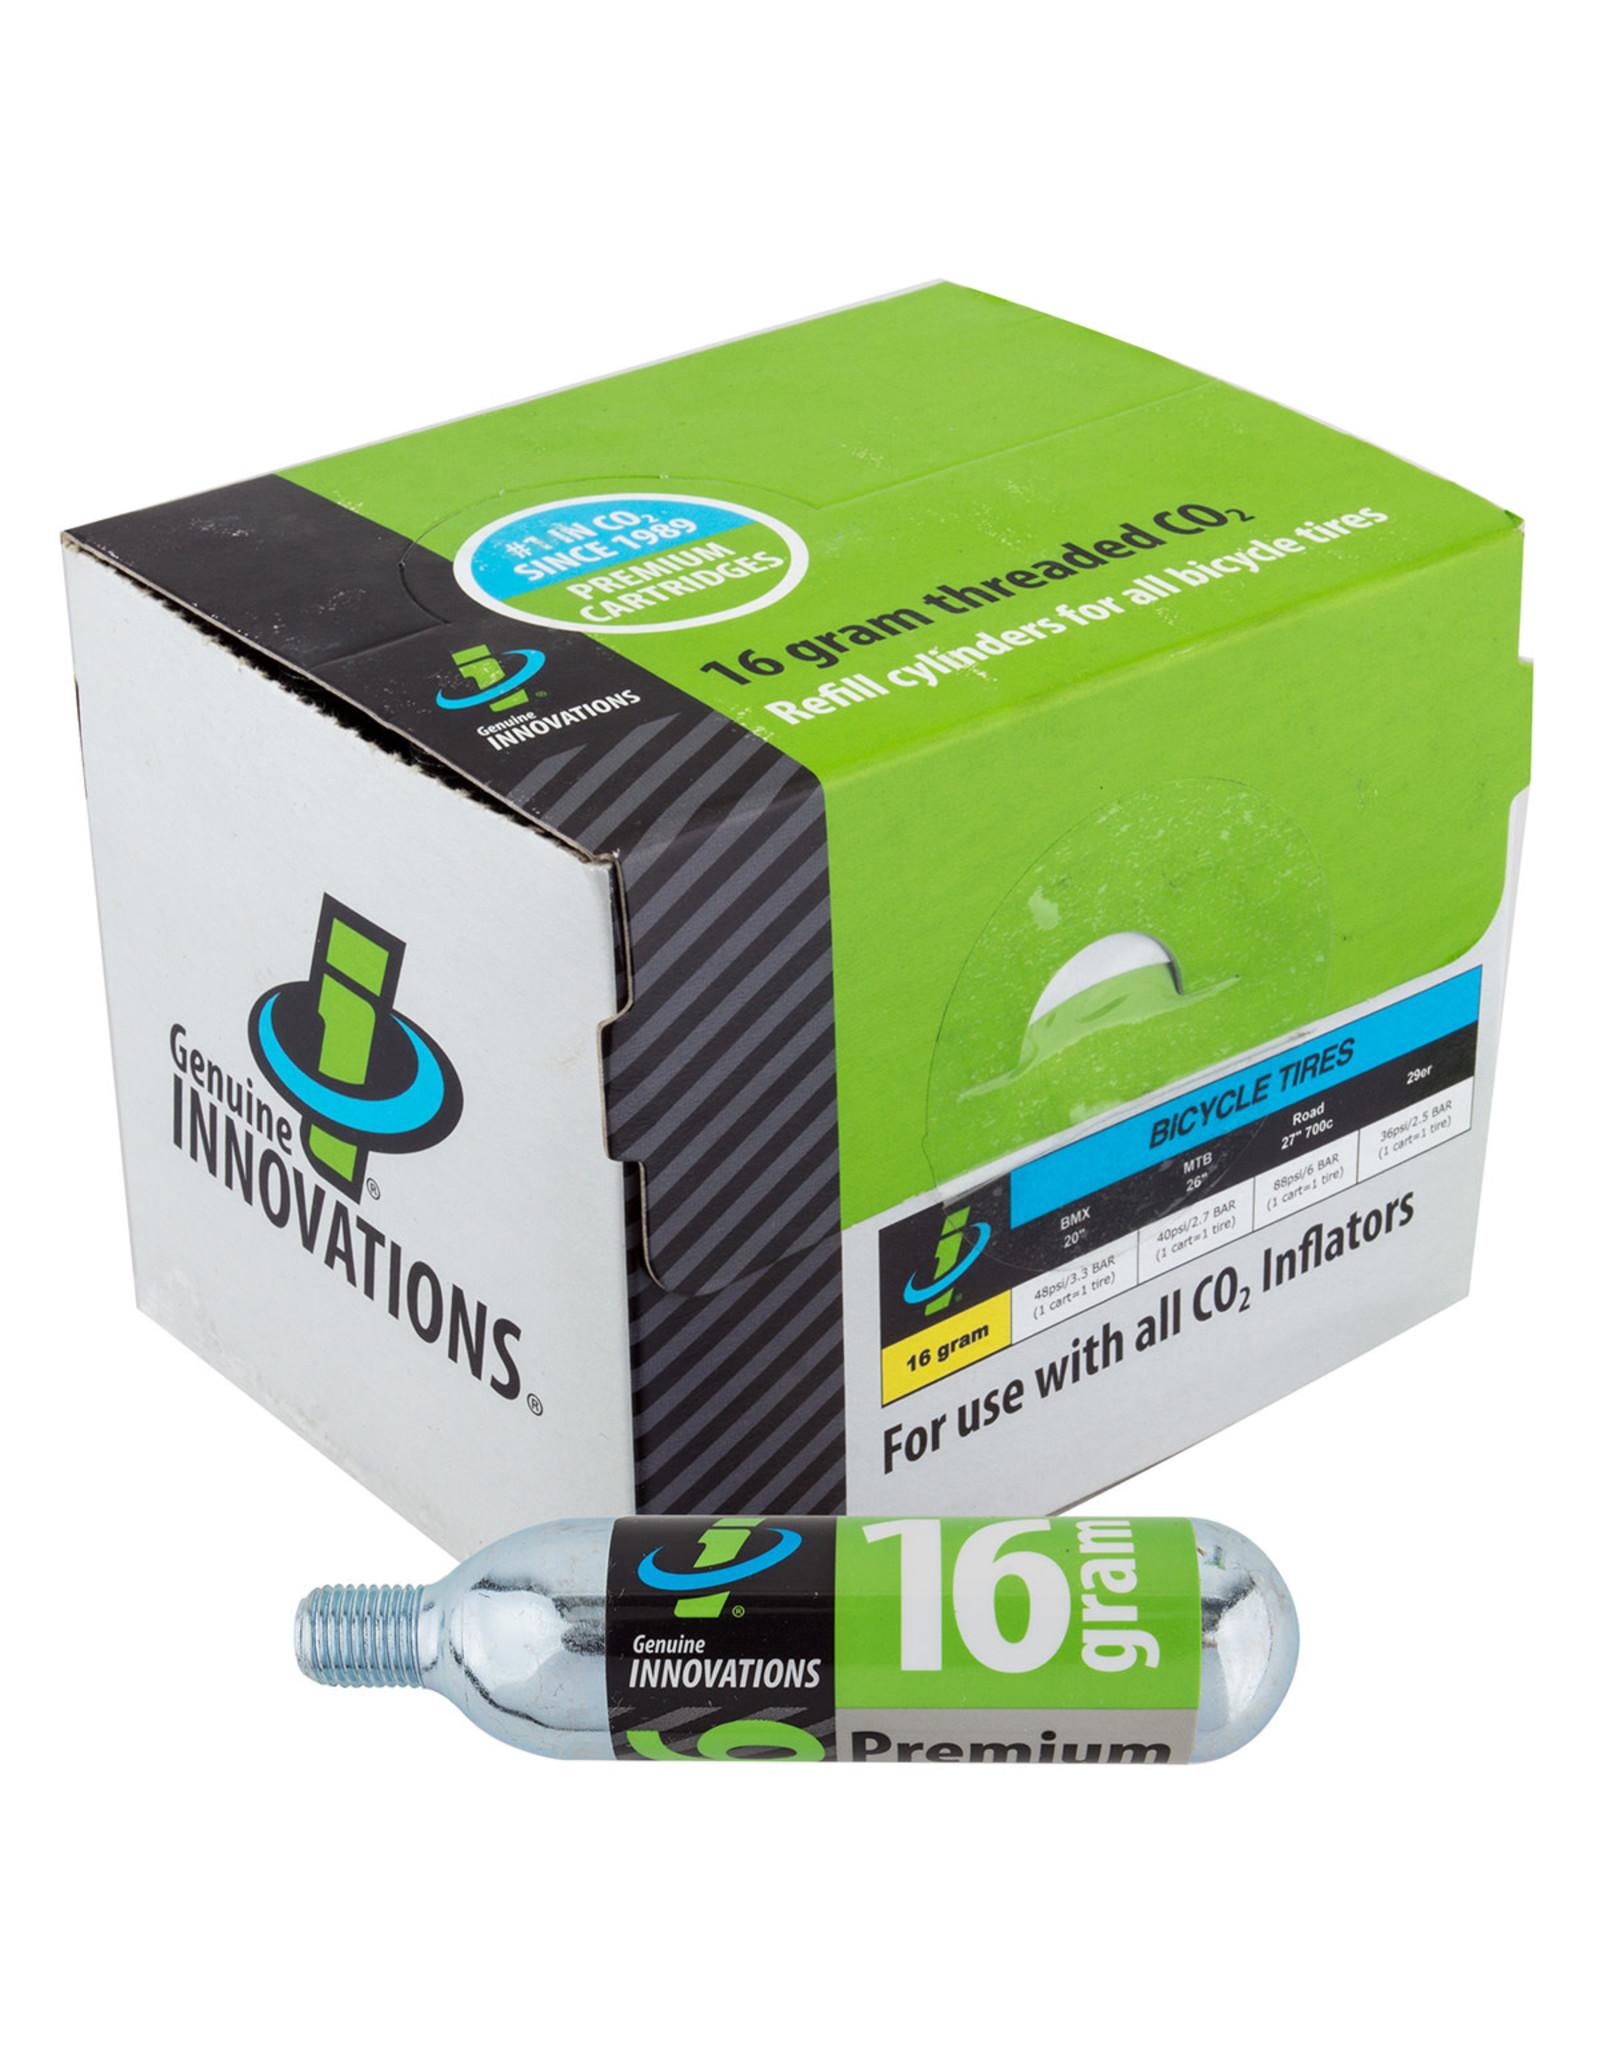 Pump Co2 16G Threaded Box of 270 single